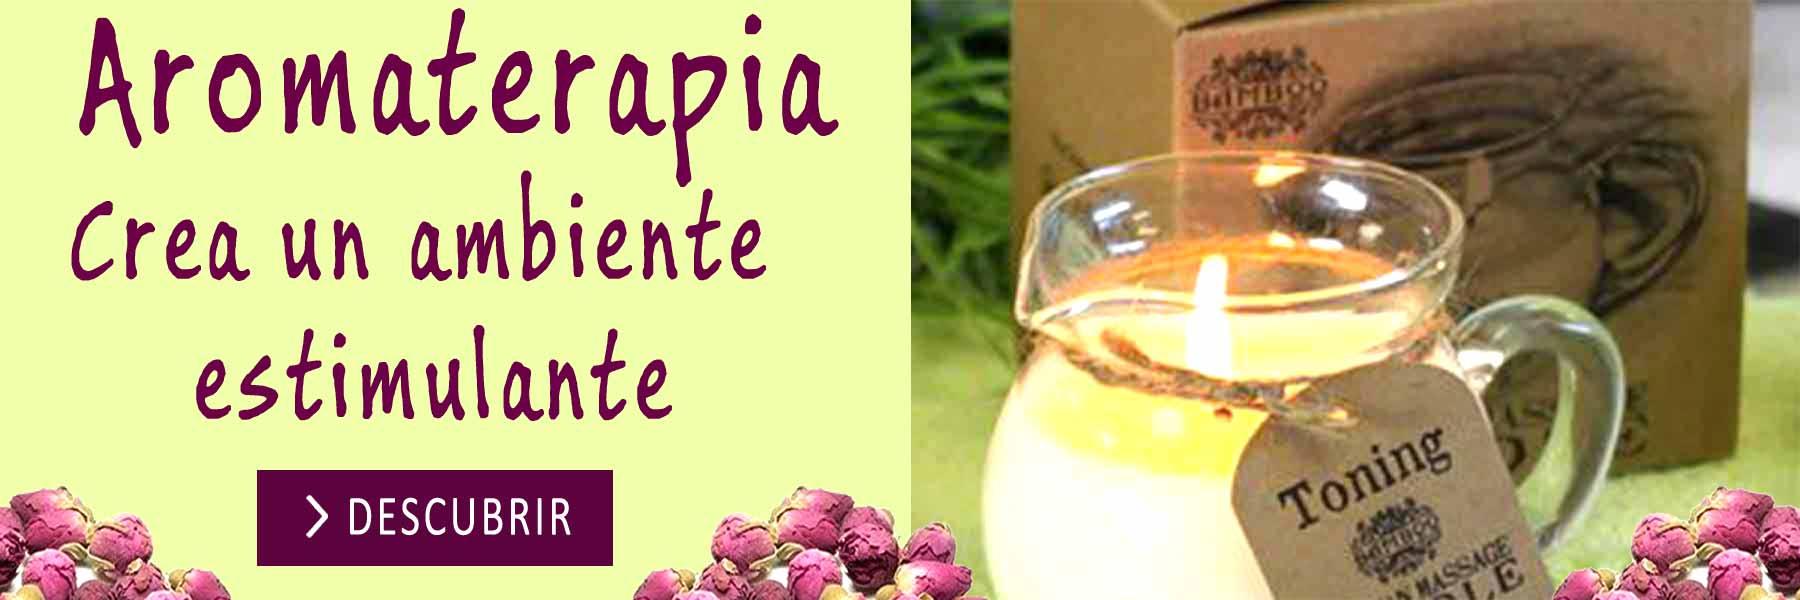 Aromaterapia, crea un ambiente Estimulante con Agradables Aromas.